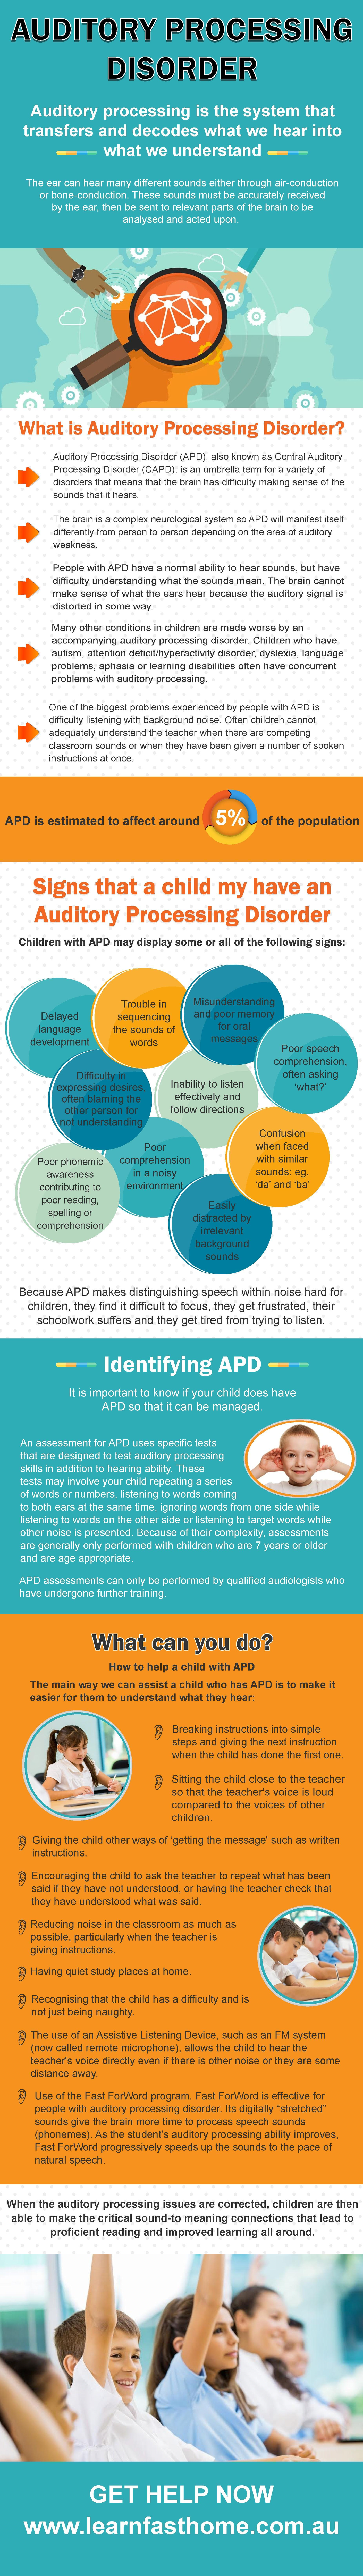 APD_infographic1.jpg